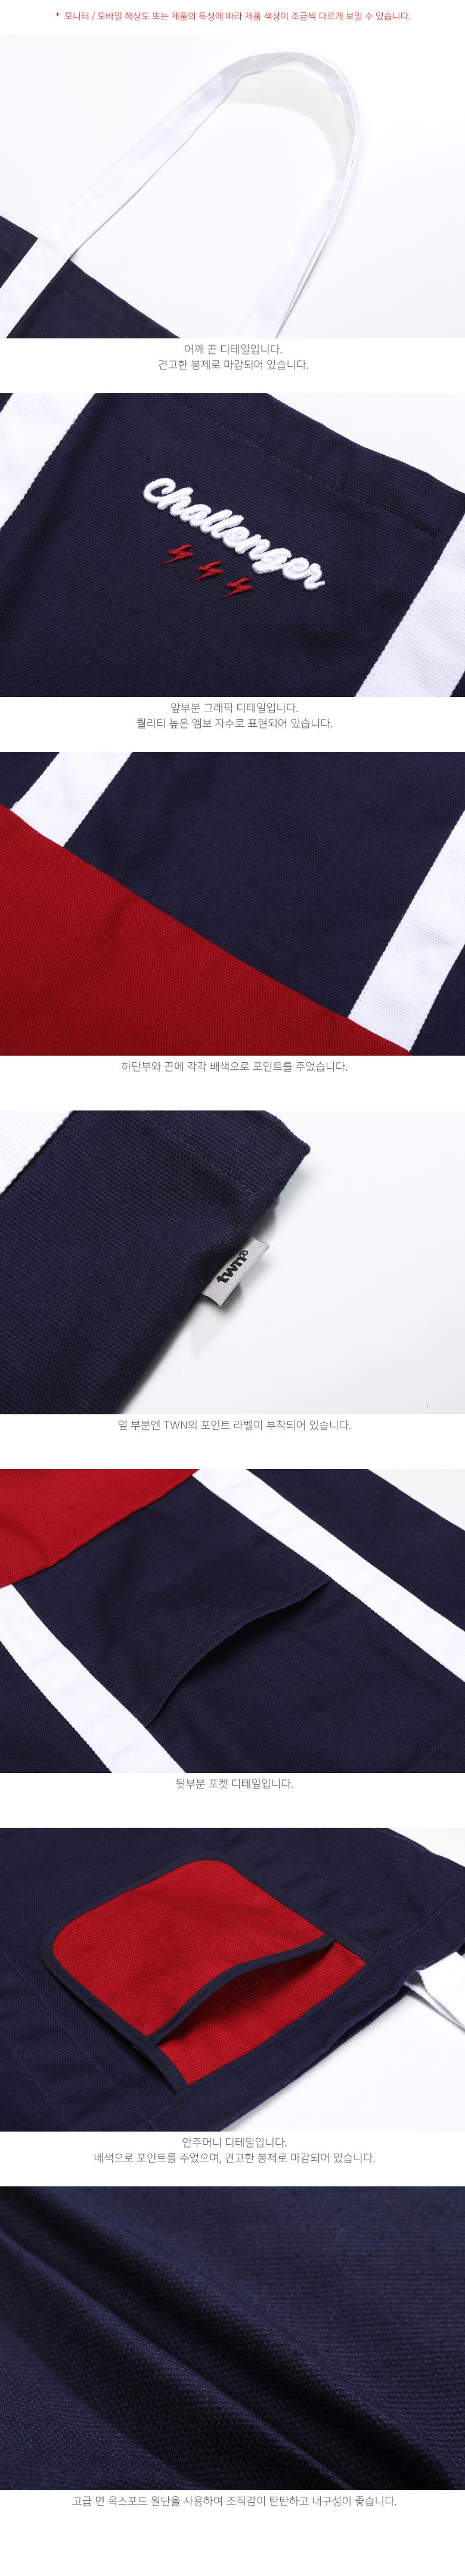 20190904_twn_challengerecobag_detail_navy_lm_02.jpg